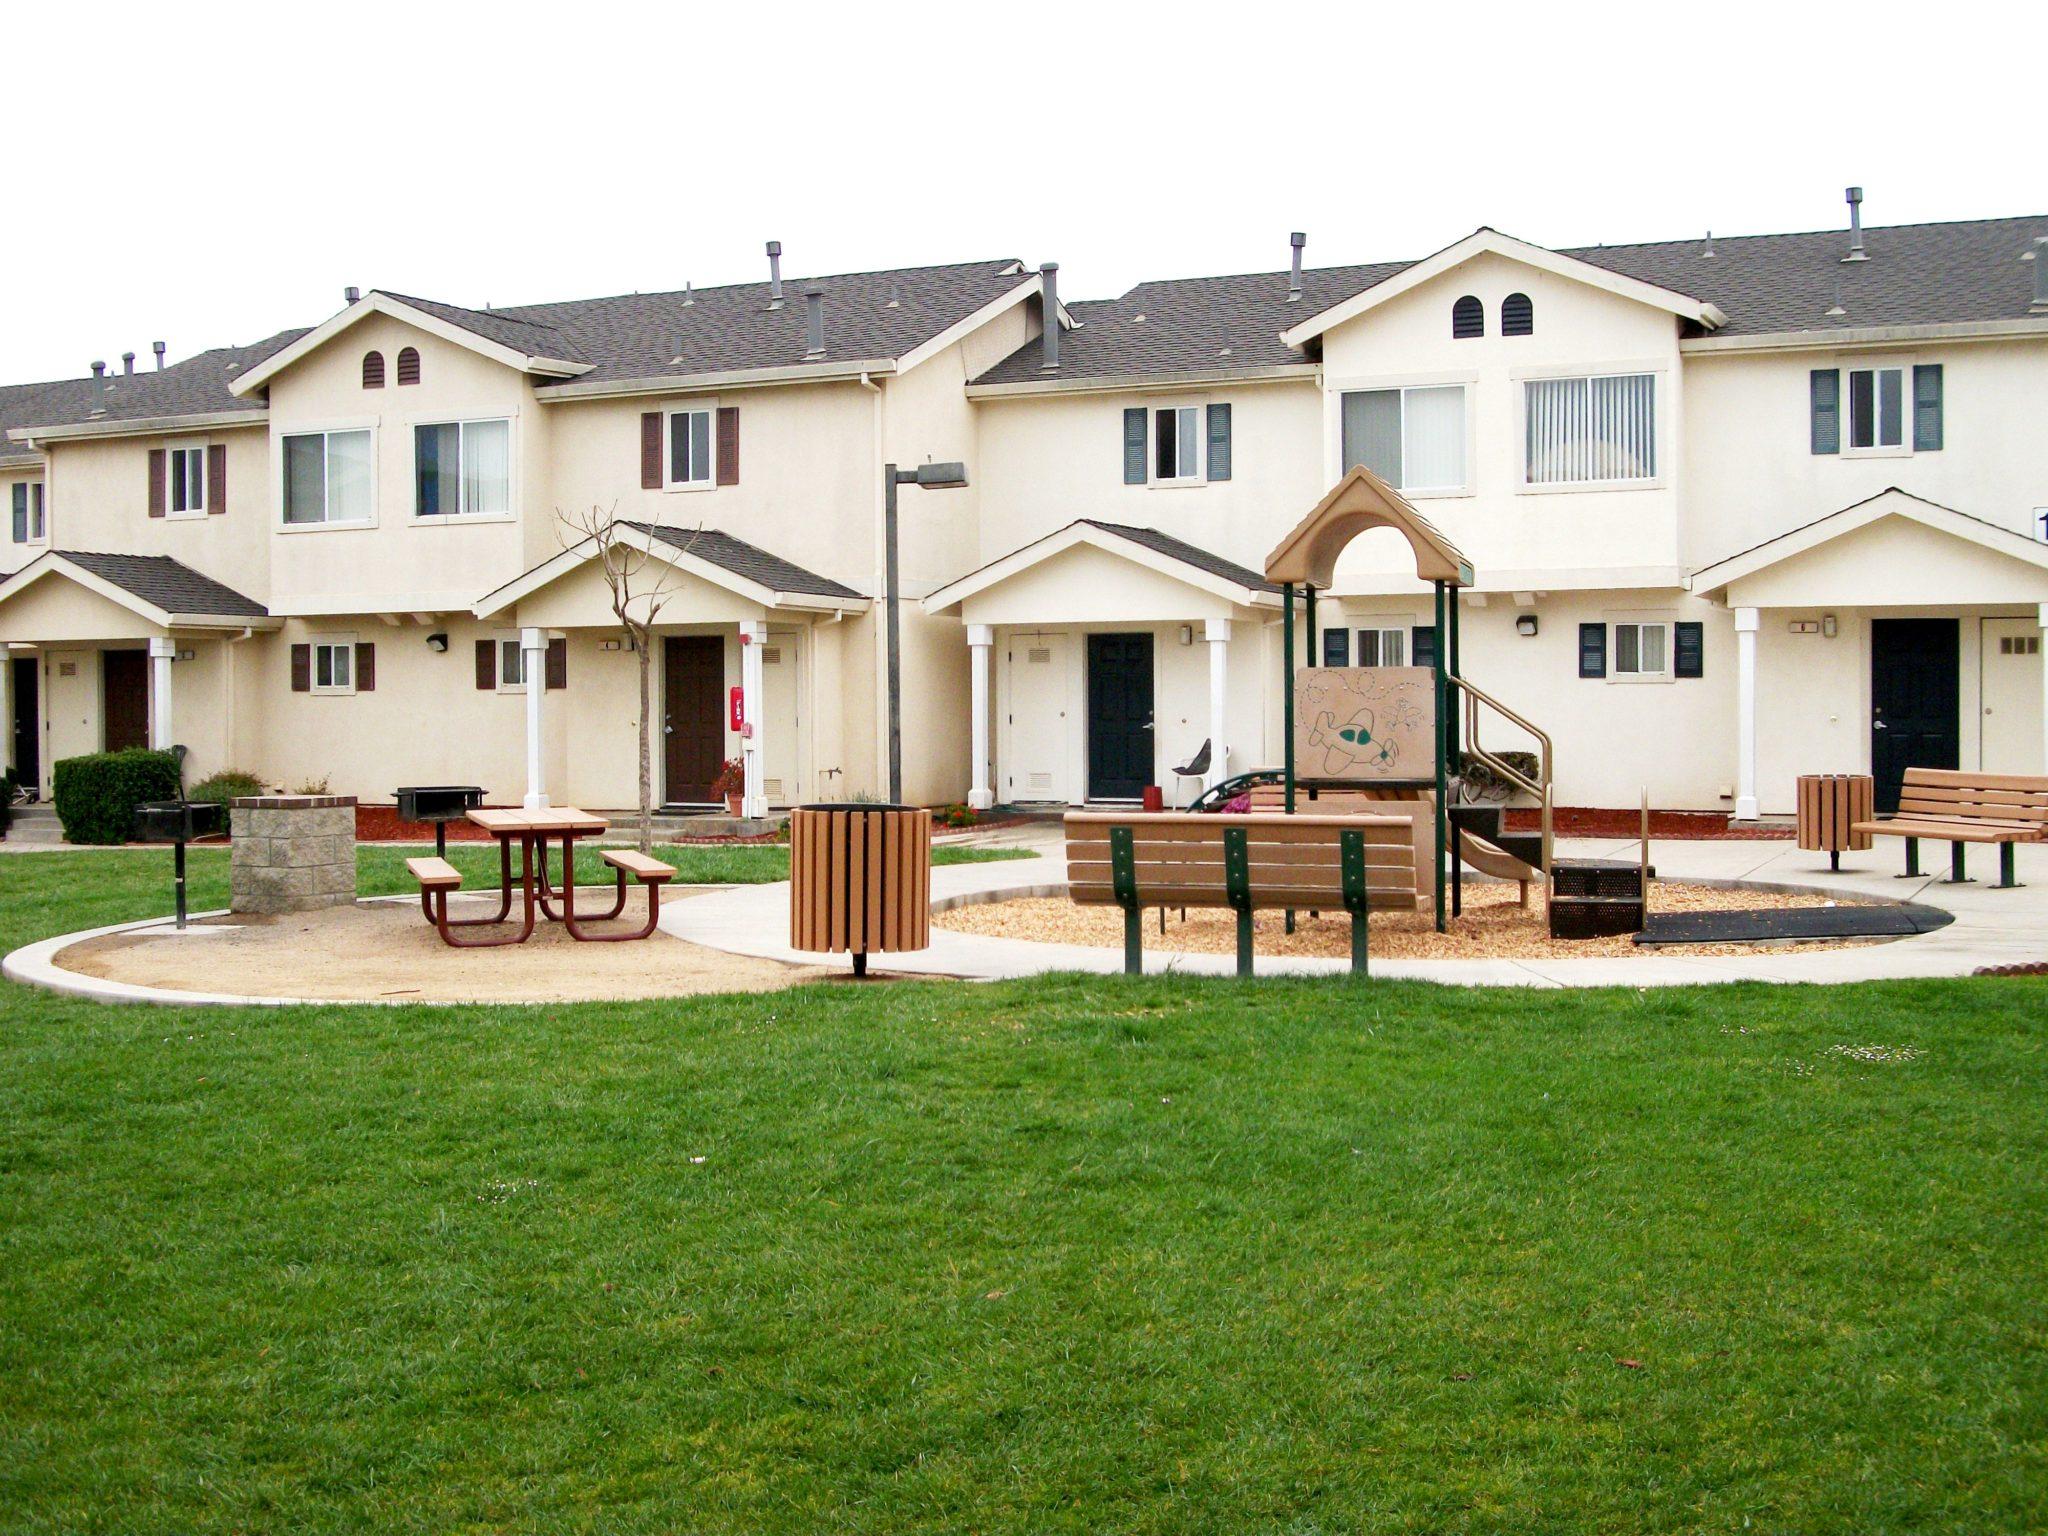 Chispa Mountain View Townhomes